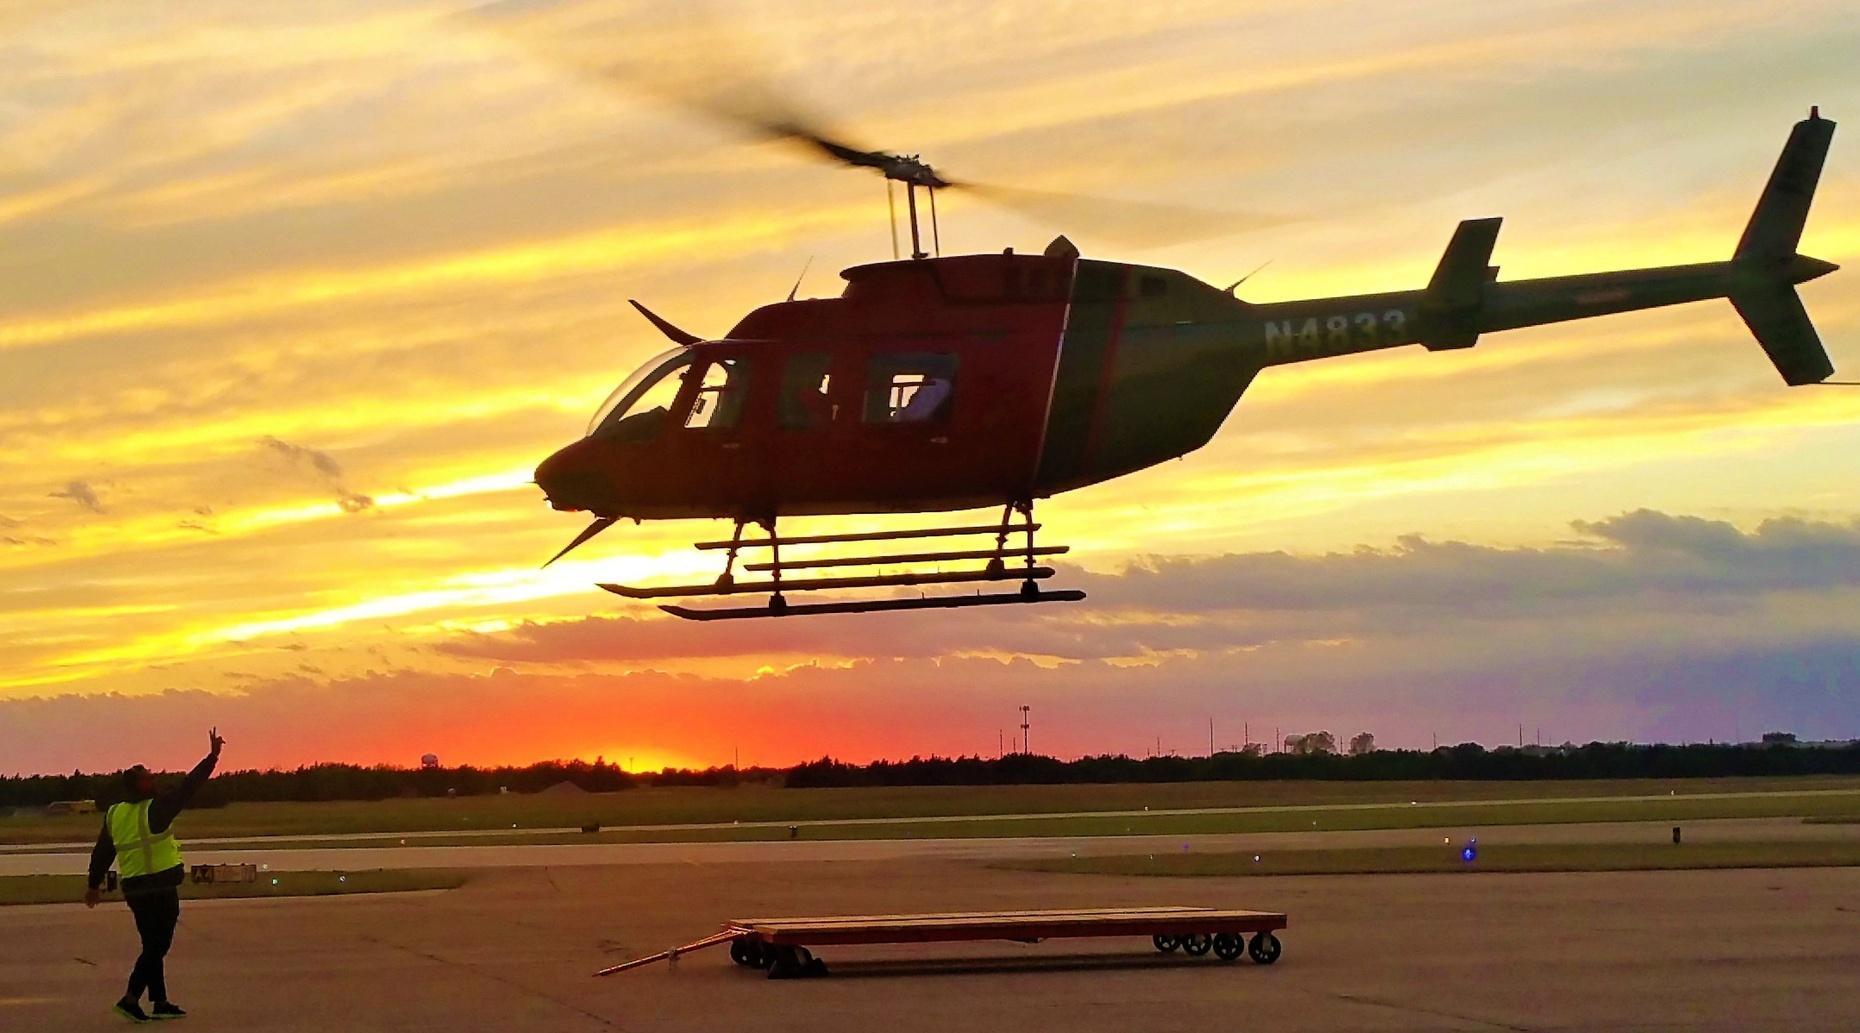 Private Helicopter Flight over Dallas